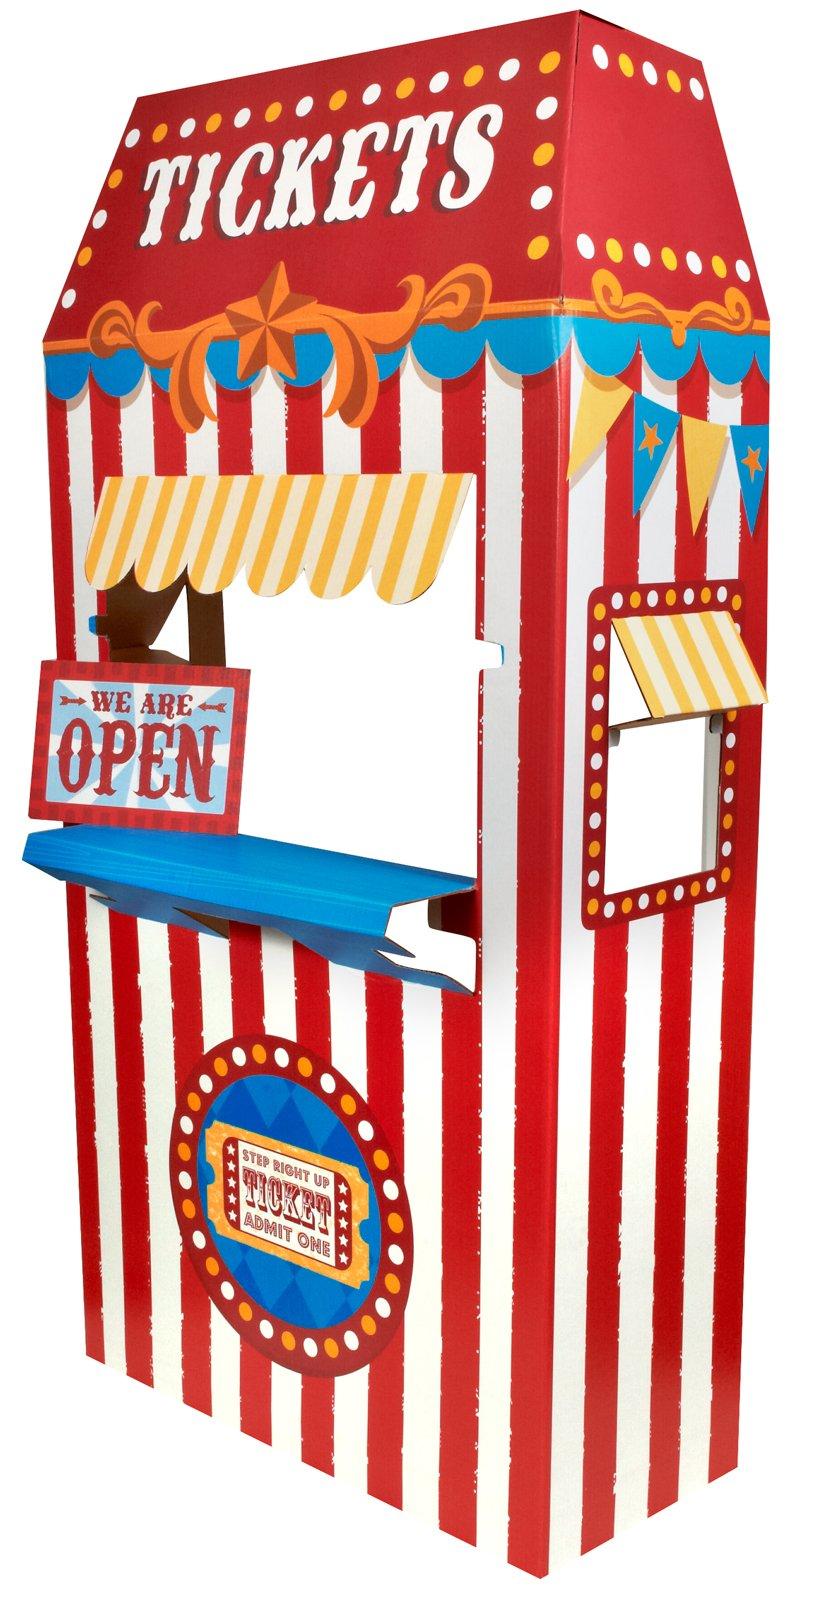 County Fair Booth Clipart.